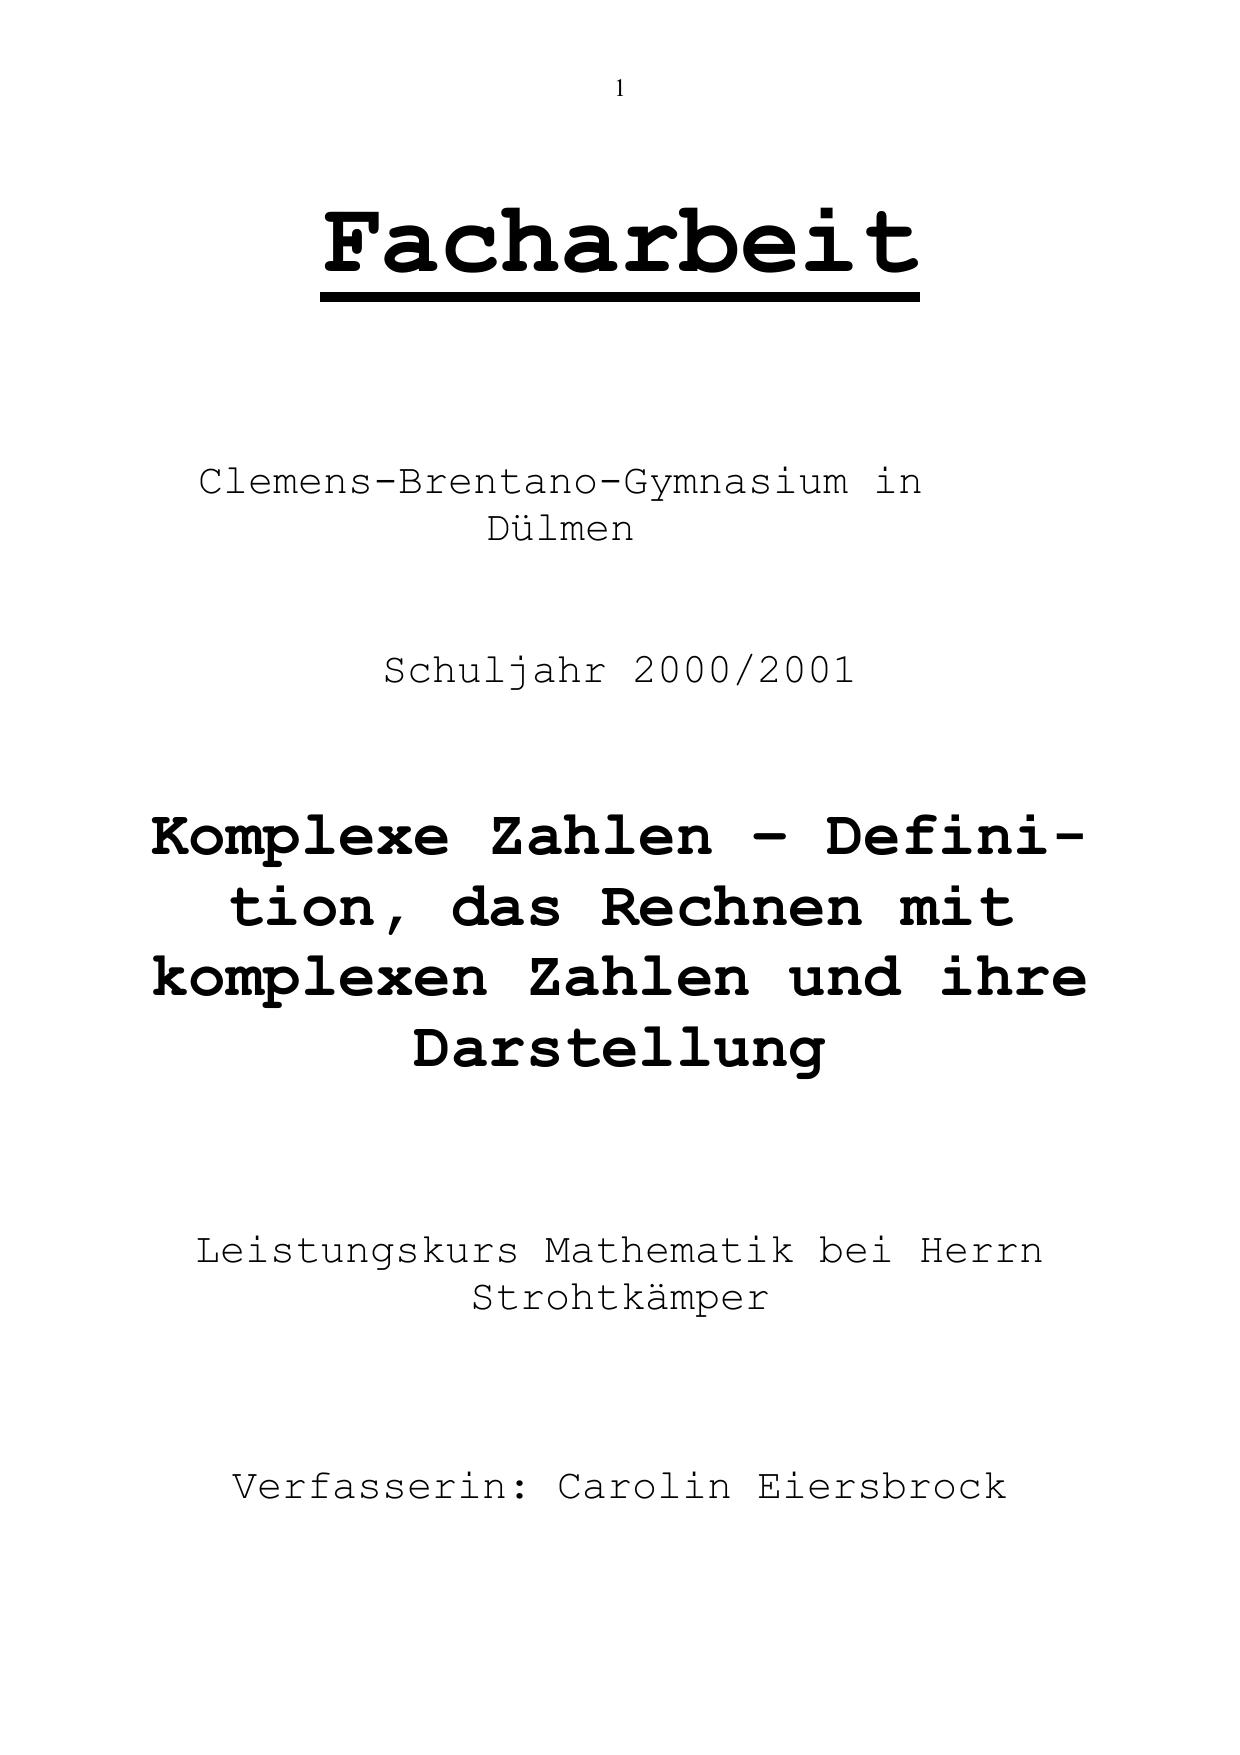 Facharbeit - Fundus.org